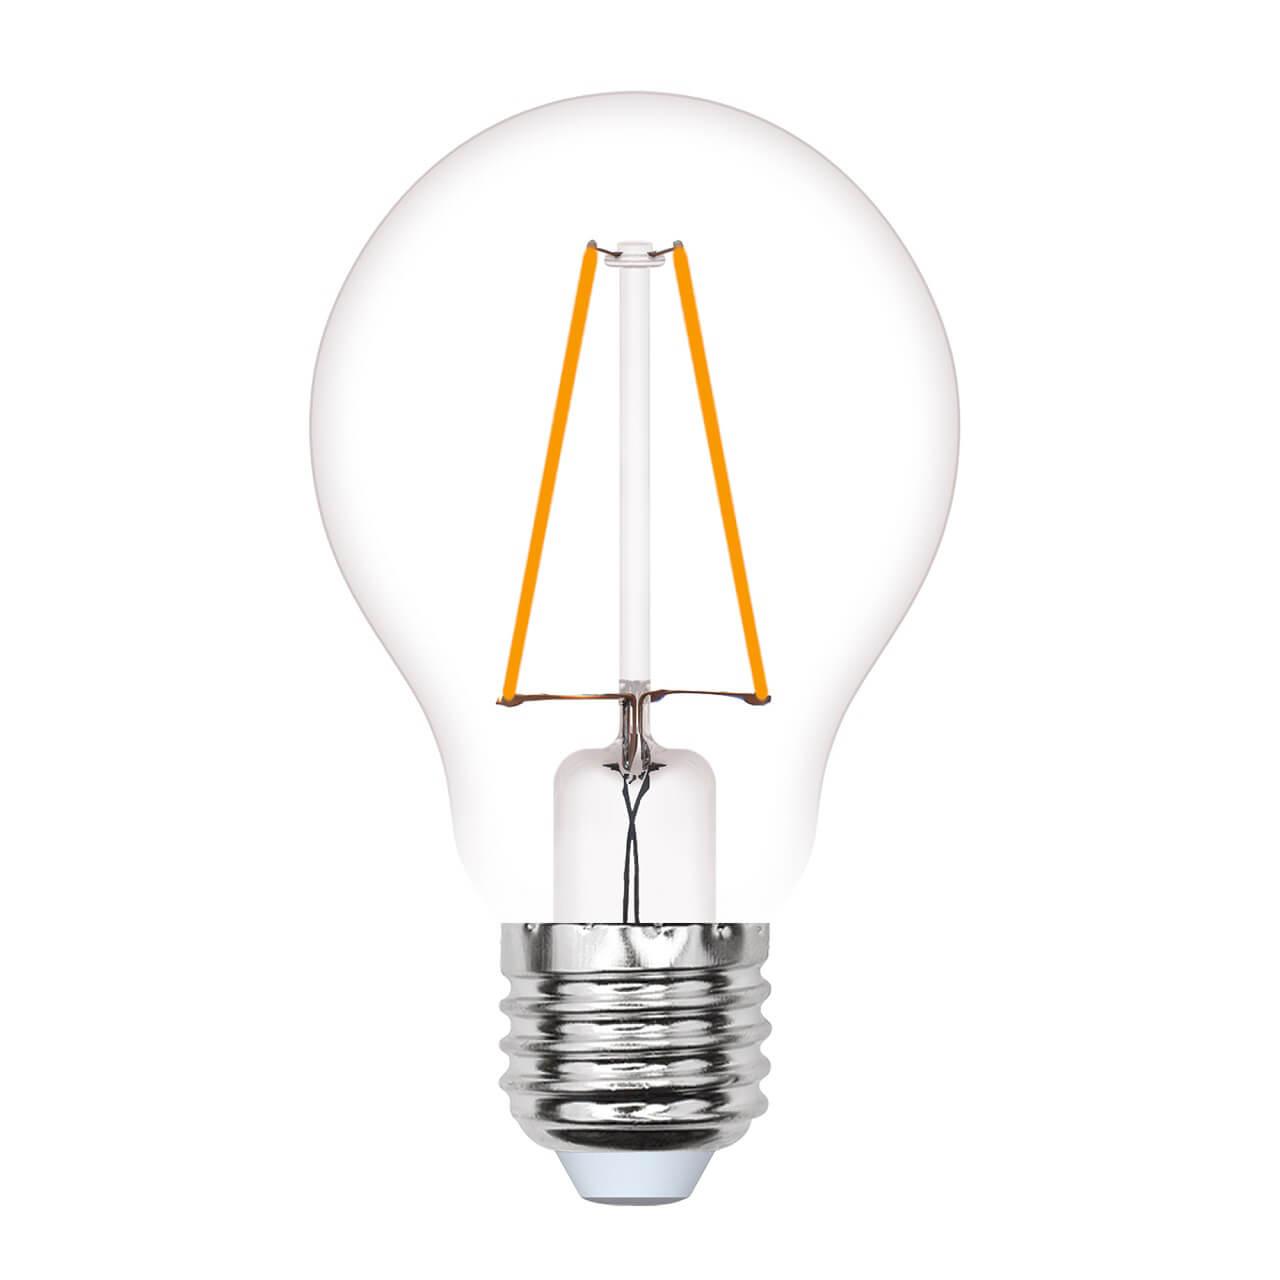 Лампа светодиодная филаментная (UL-00000849) E27 4W 2250K прозрачная LED-A67-4W/GOLDEN/E27 GLV21GO